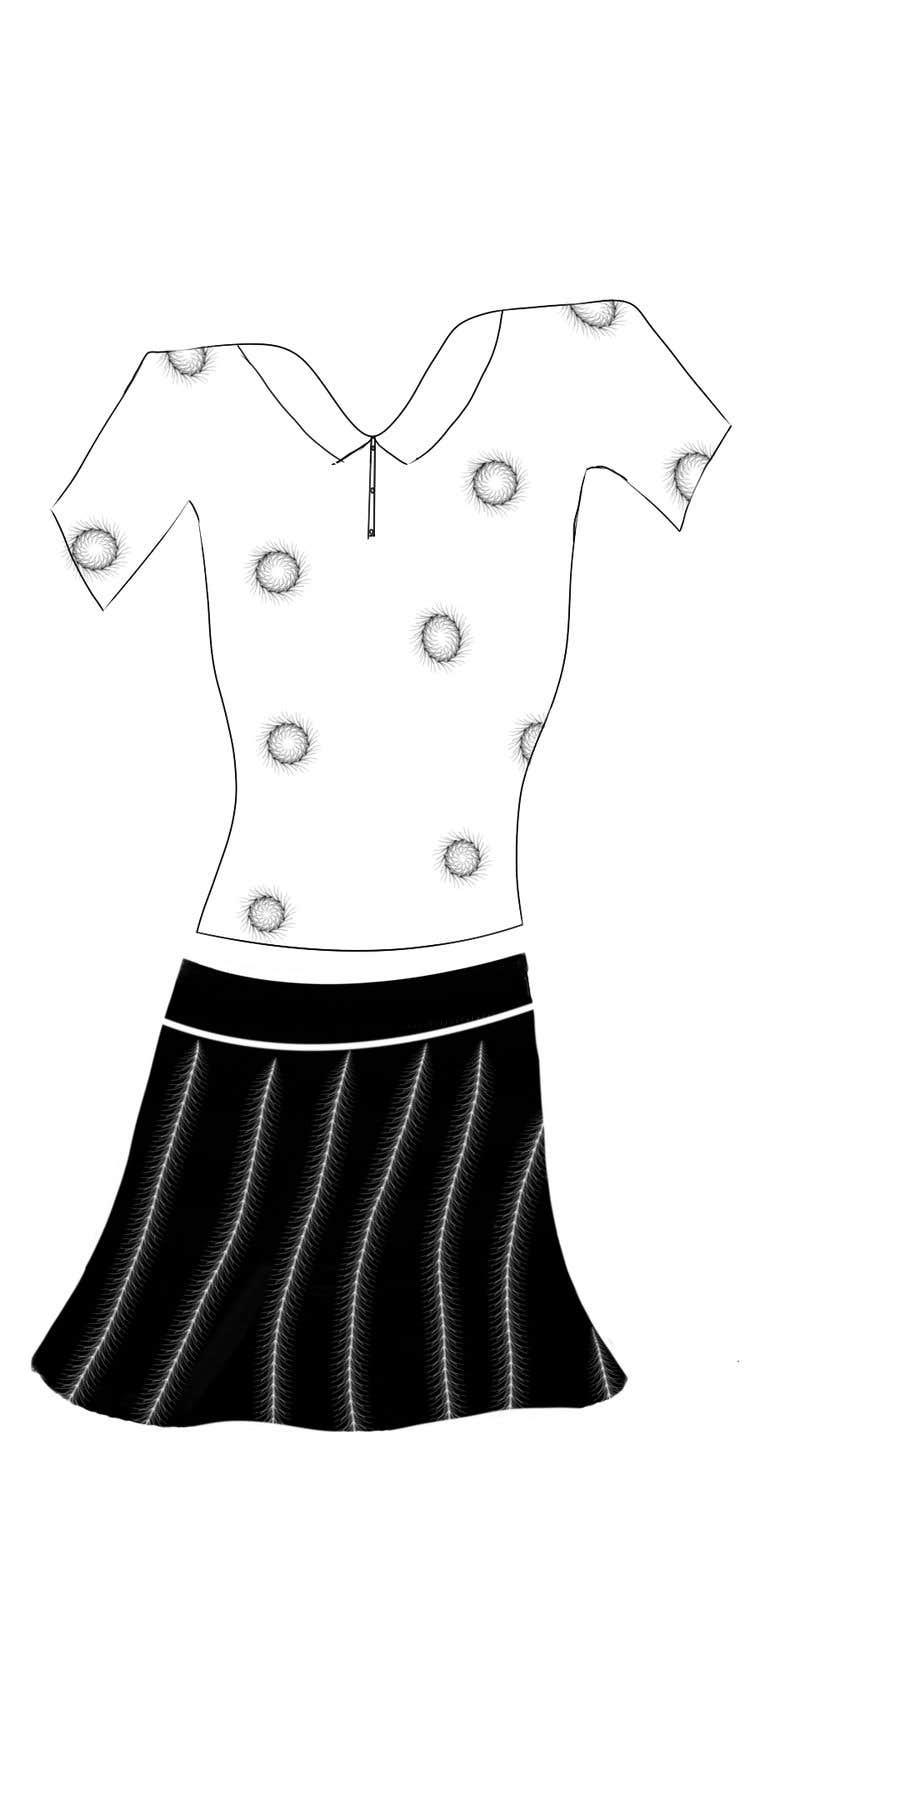 Bài tham dự cuộc thi #                                        78                                      cho                                         Sportswear fashion designer - pickleball